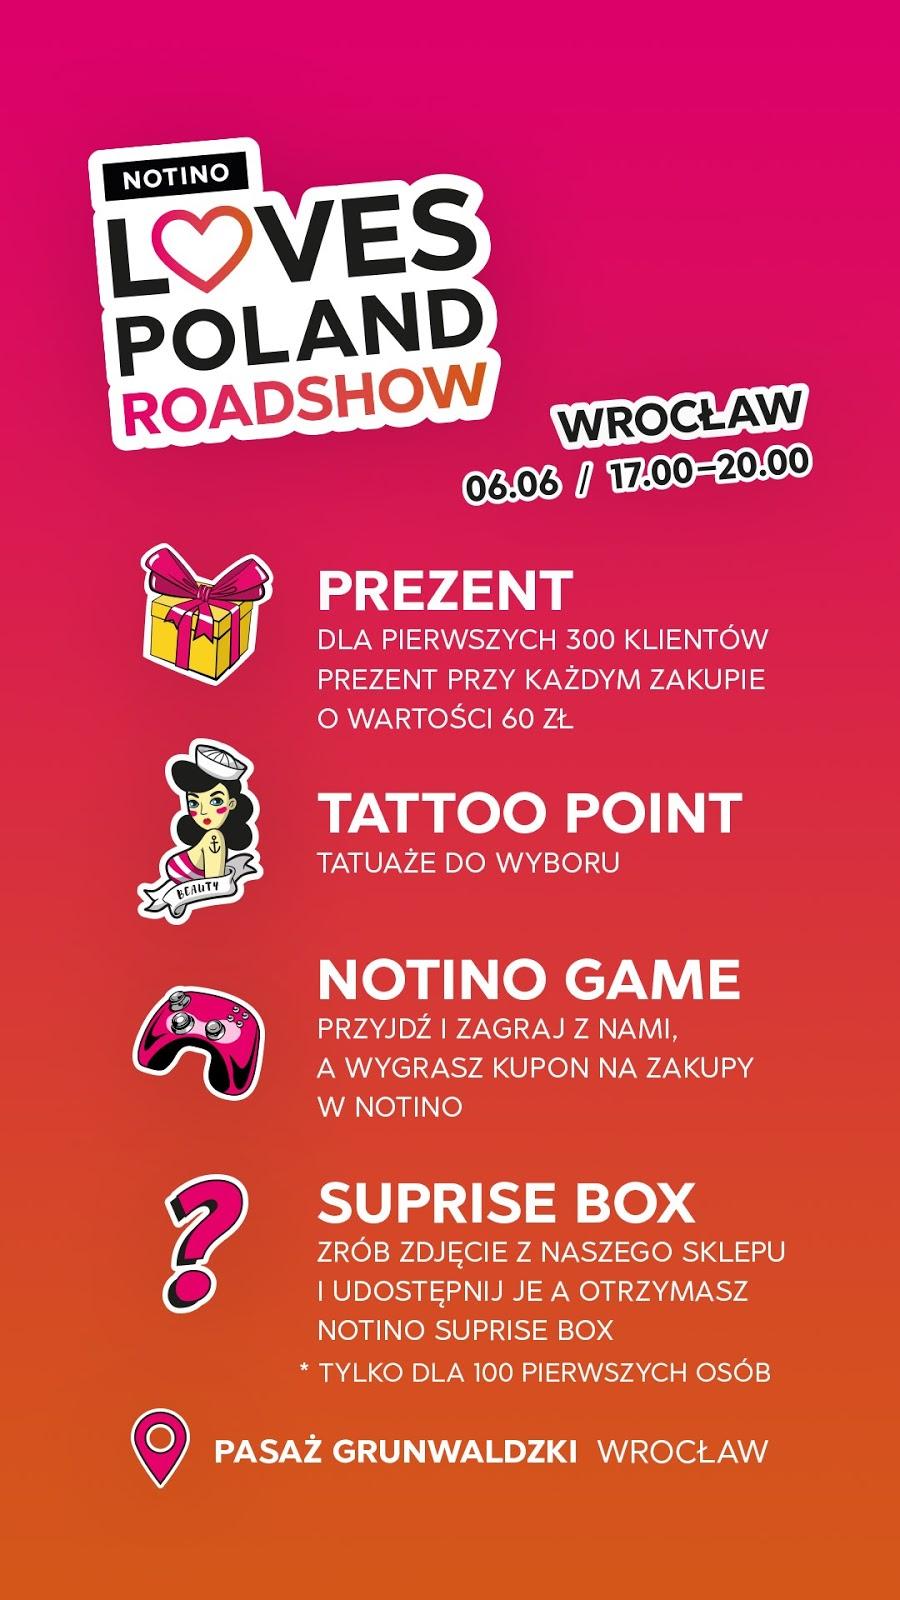 Notino Wrocław event